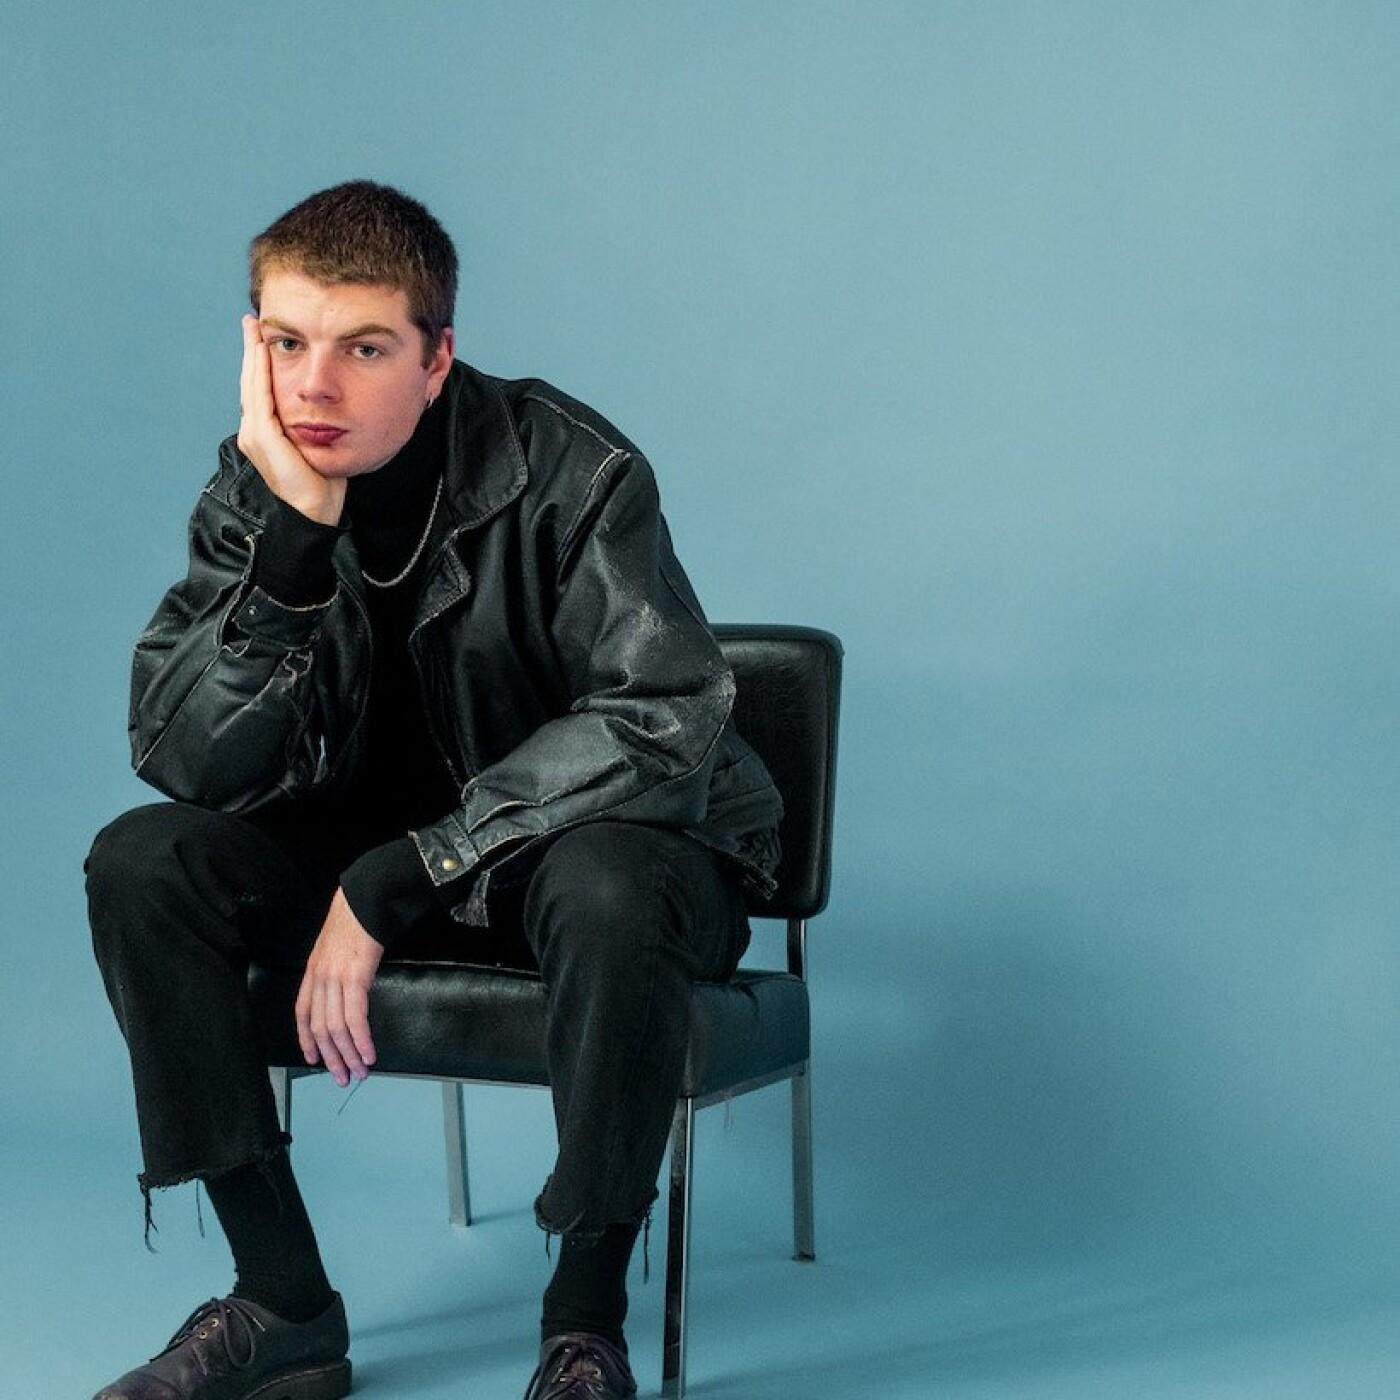 Artiste du jour, Johnny Jane présente son single Maintenant - 29 04 21 - StereoChic Radio